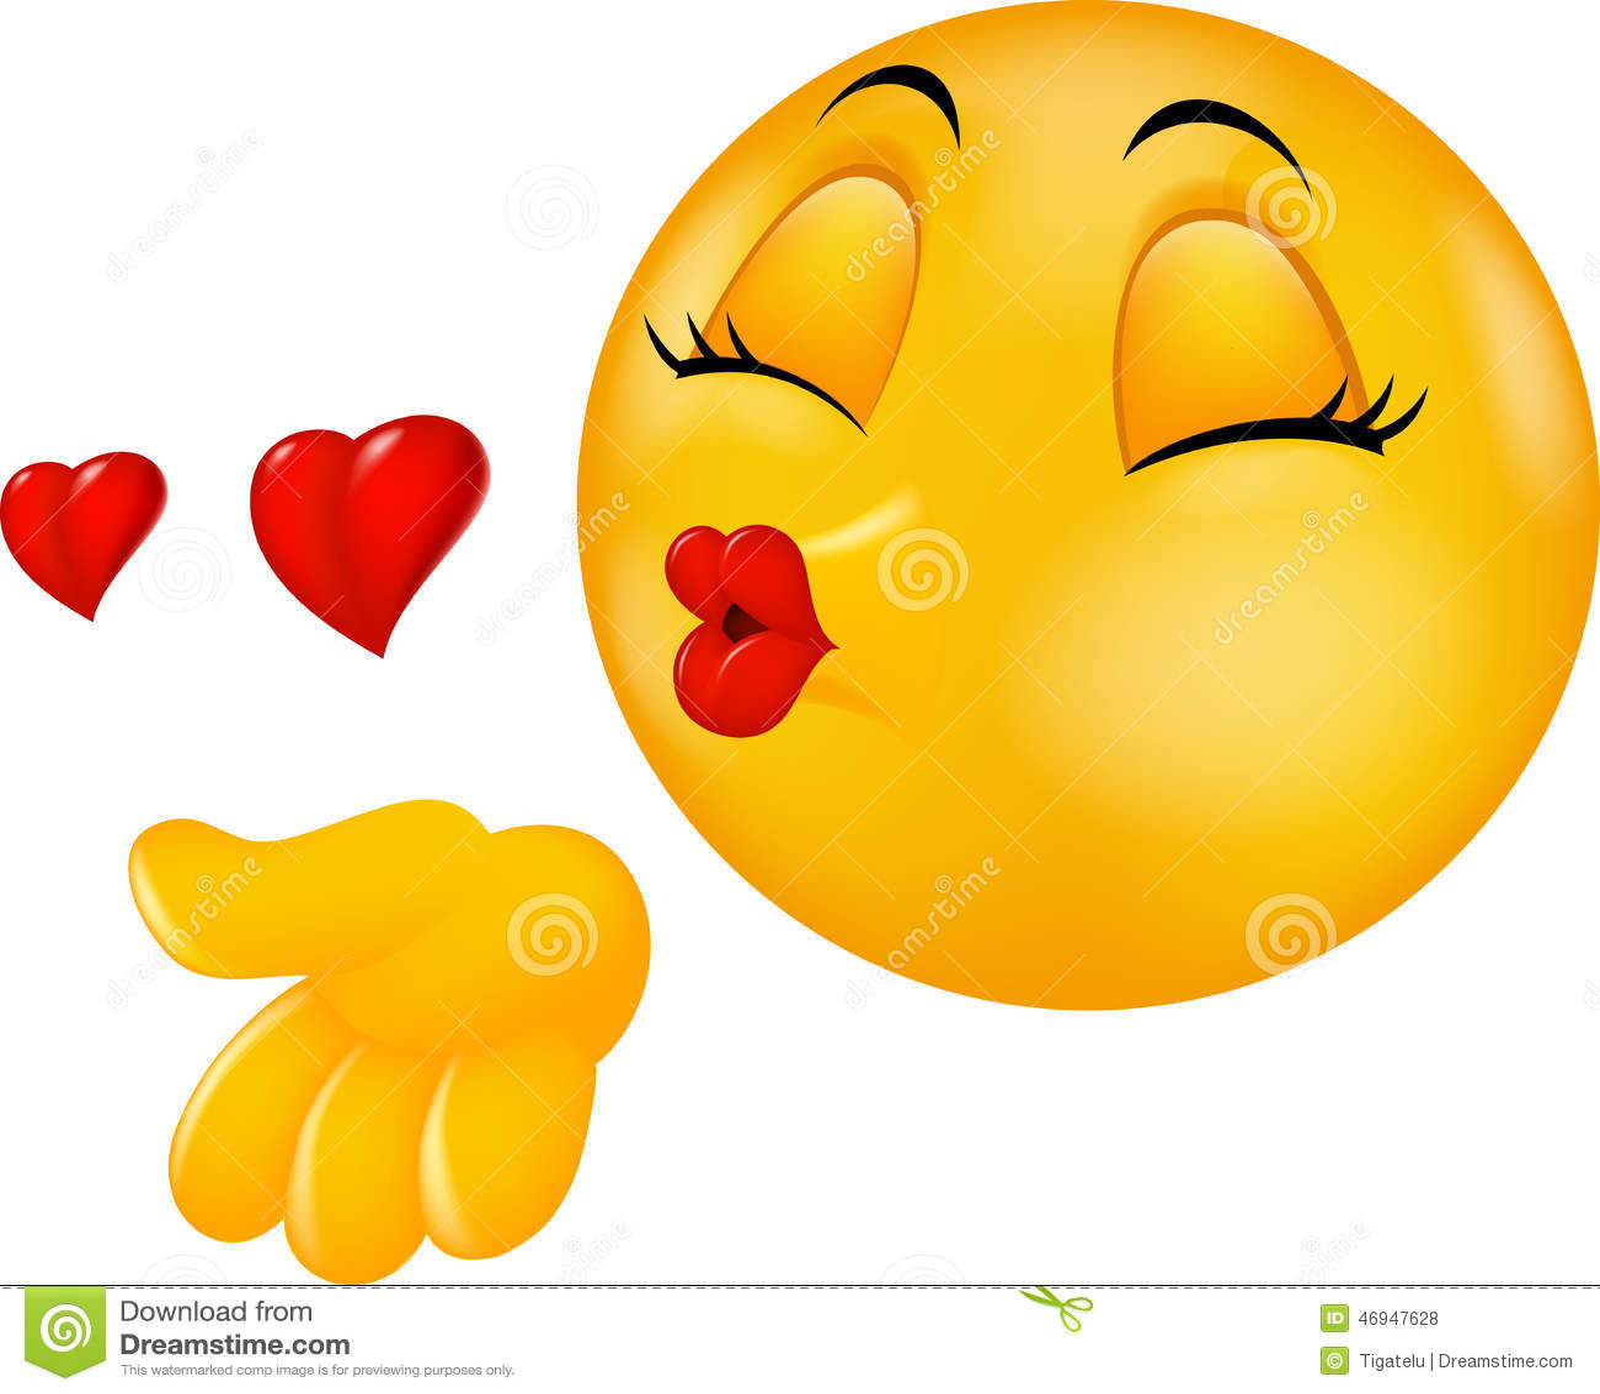 cartoon round kissing face emoticon making air kiss stock vector rh dreamstime com cartoon kissy face cartoon kissy face gif